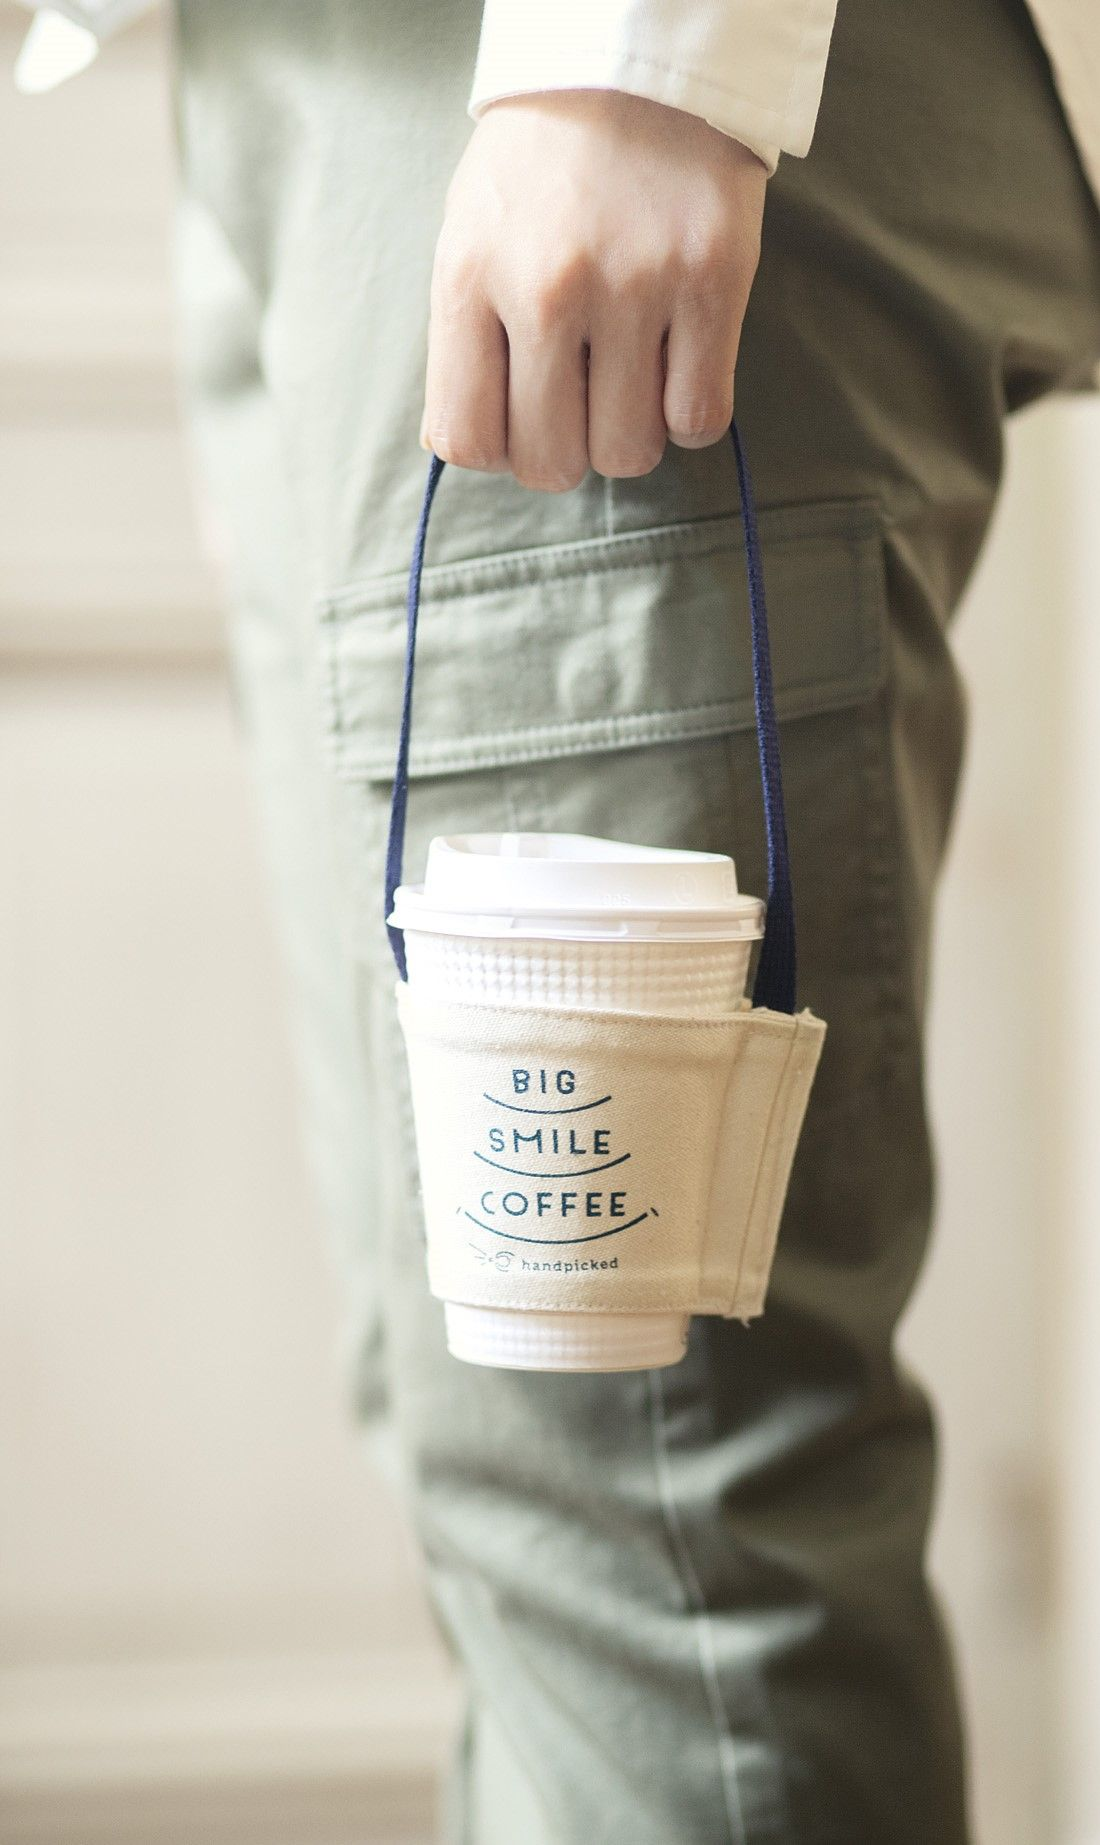 Big Smile Coffee 笑顔がつながる ドリンクホルダーの会 フェリシモ Envases Y Empaques Diseno De Envases Para Alimentos Empaques Para Alimentos